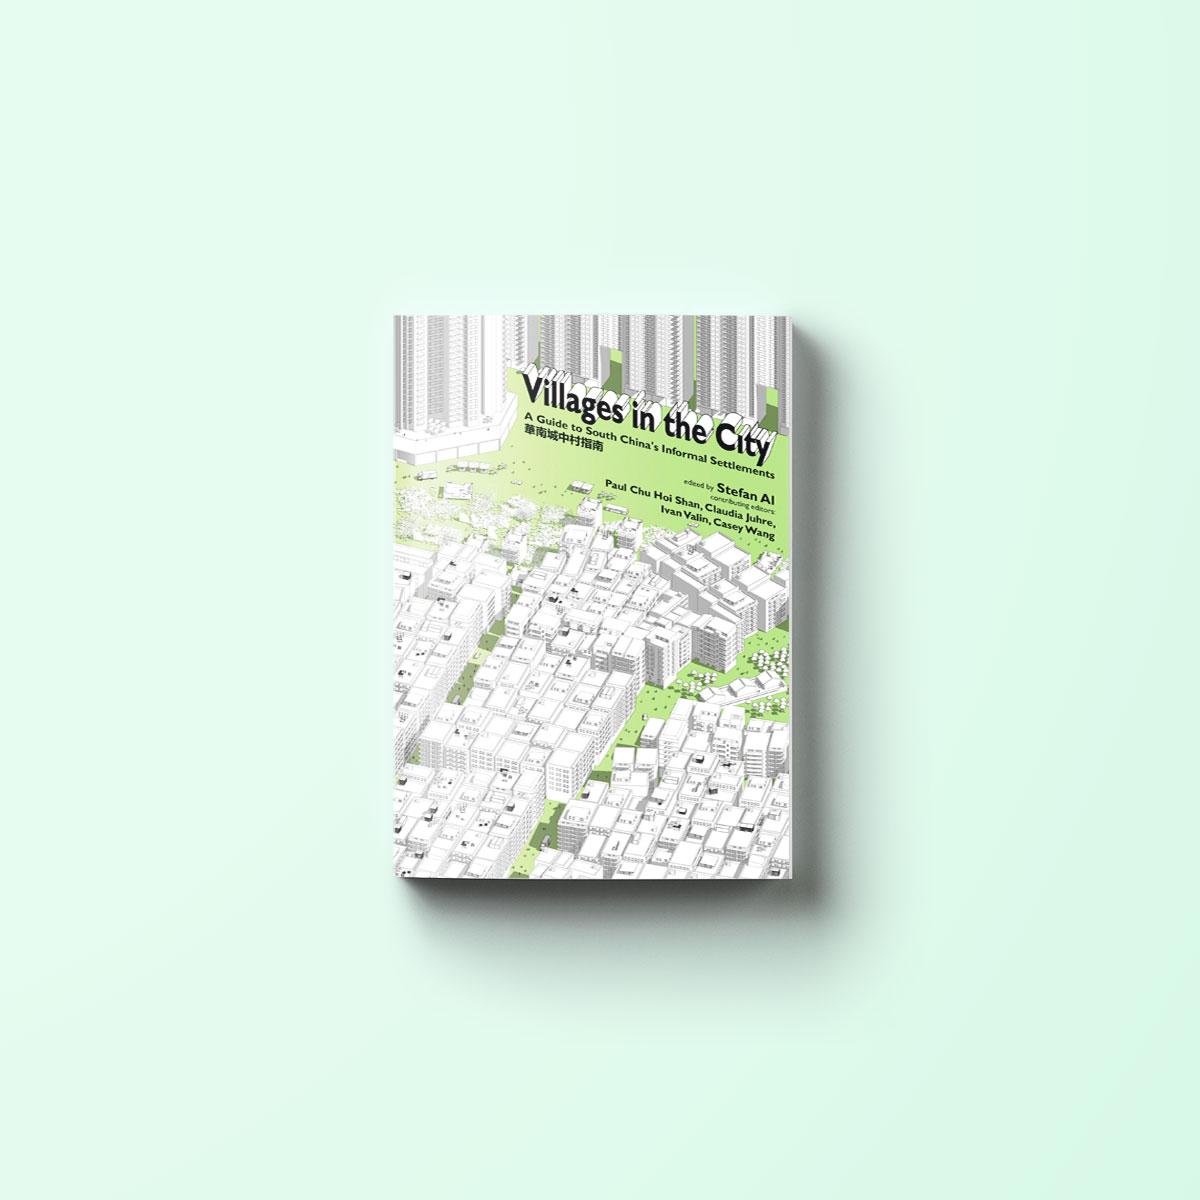 Editor: Stefan Al Hong Kong University Press, 2014